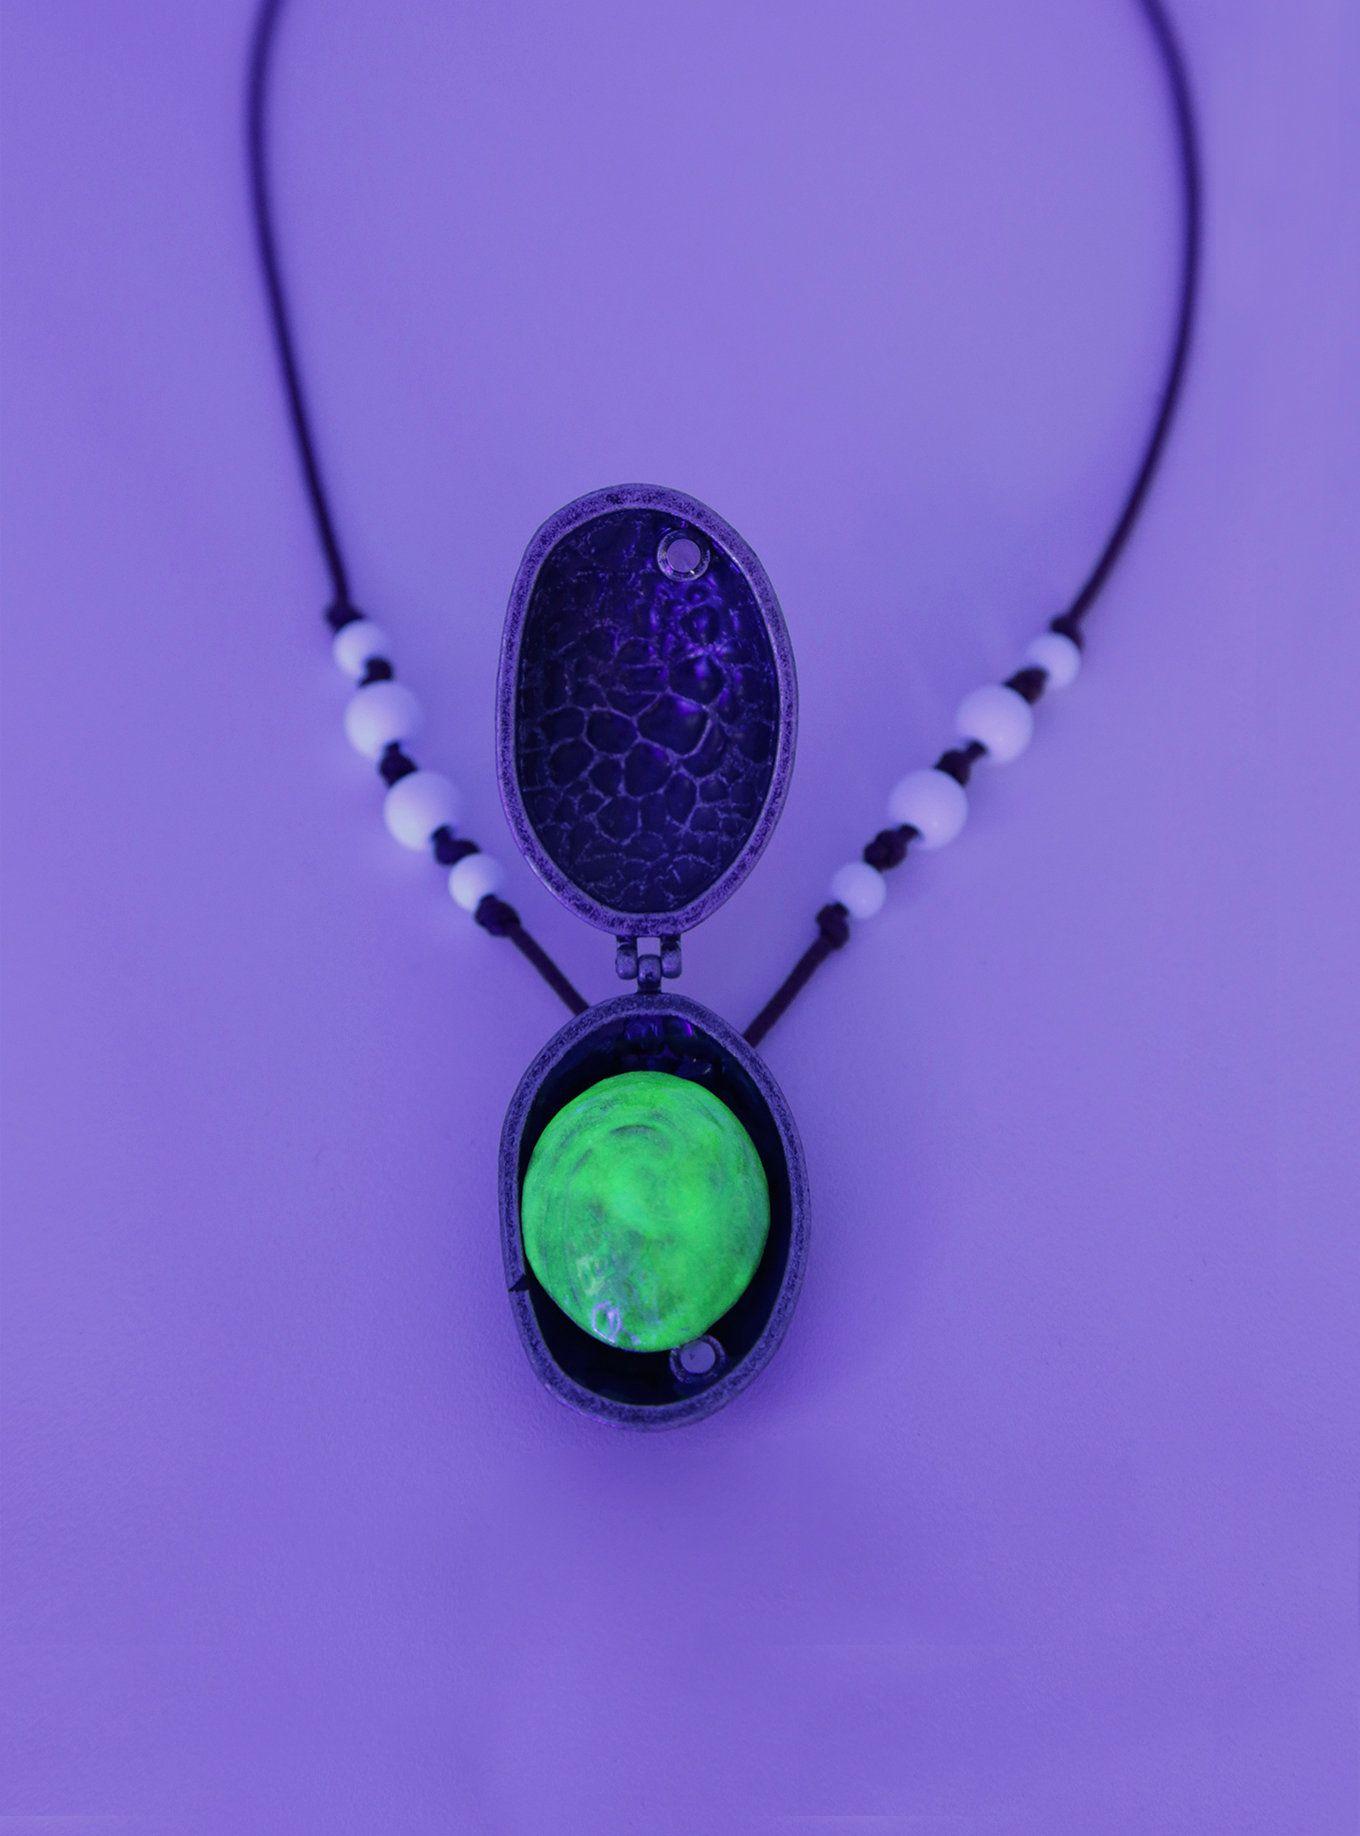 Moana Necklace Hot Topic : moana, necklace, topic, Disney, Moana, Cosplay, Necklace, Necklace,, Jewelry,